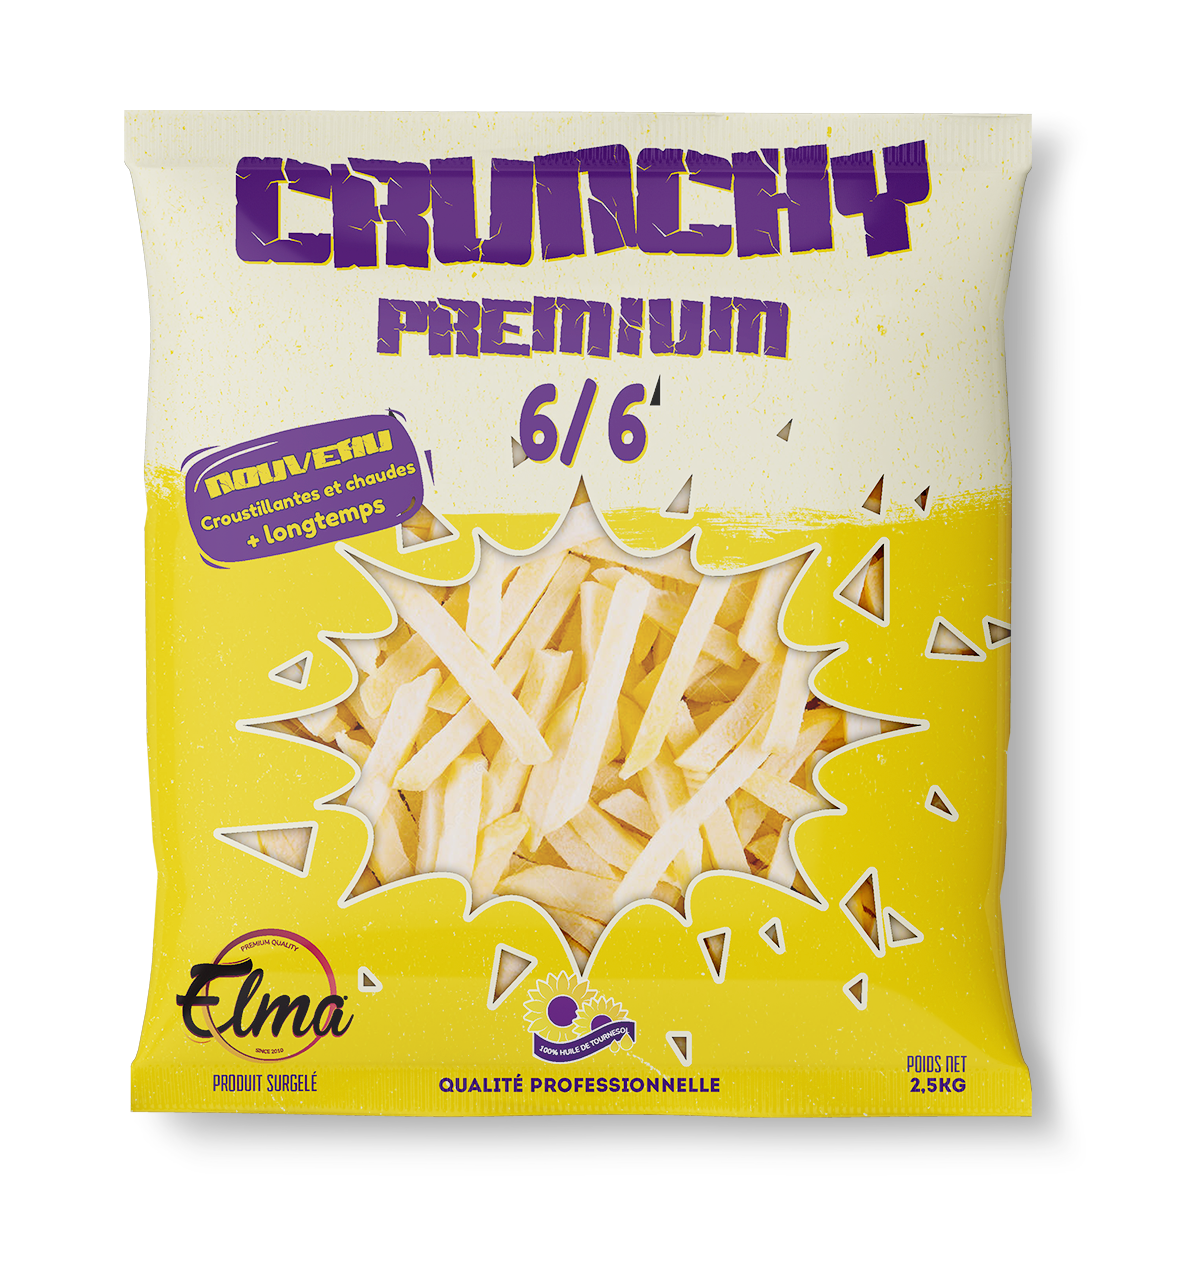 Elma-sachet-frites-crunchy-premium-6/6